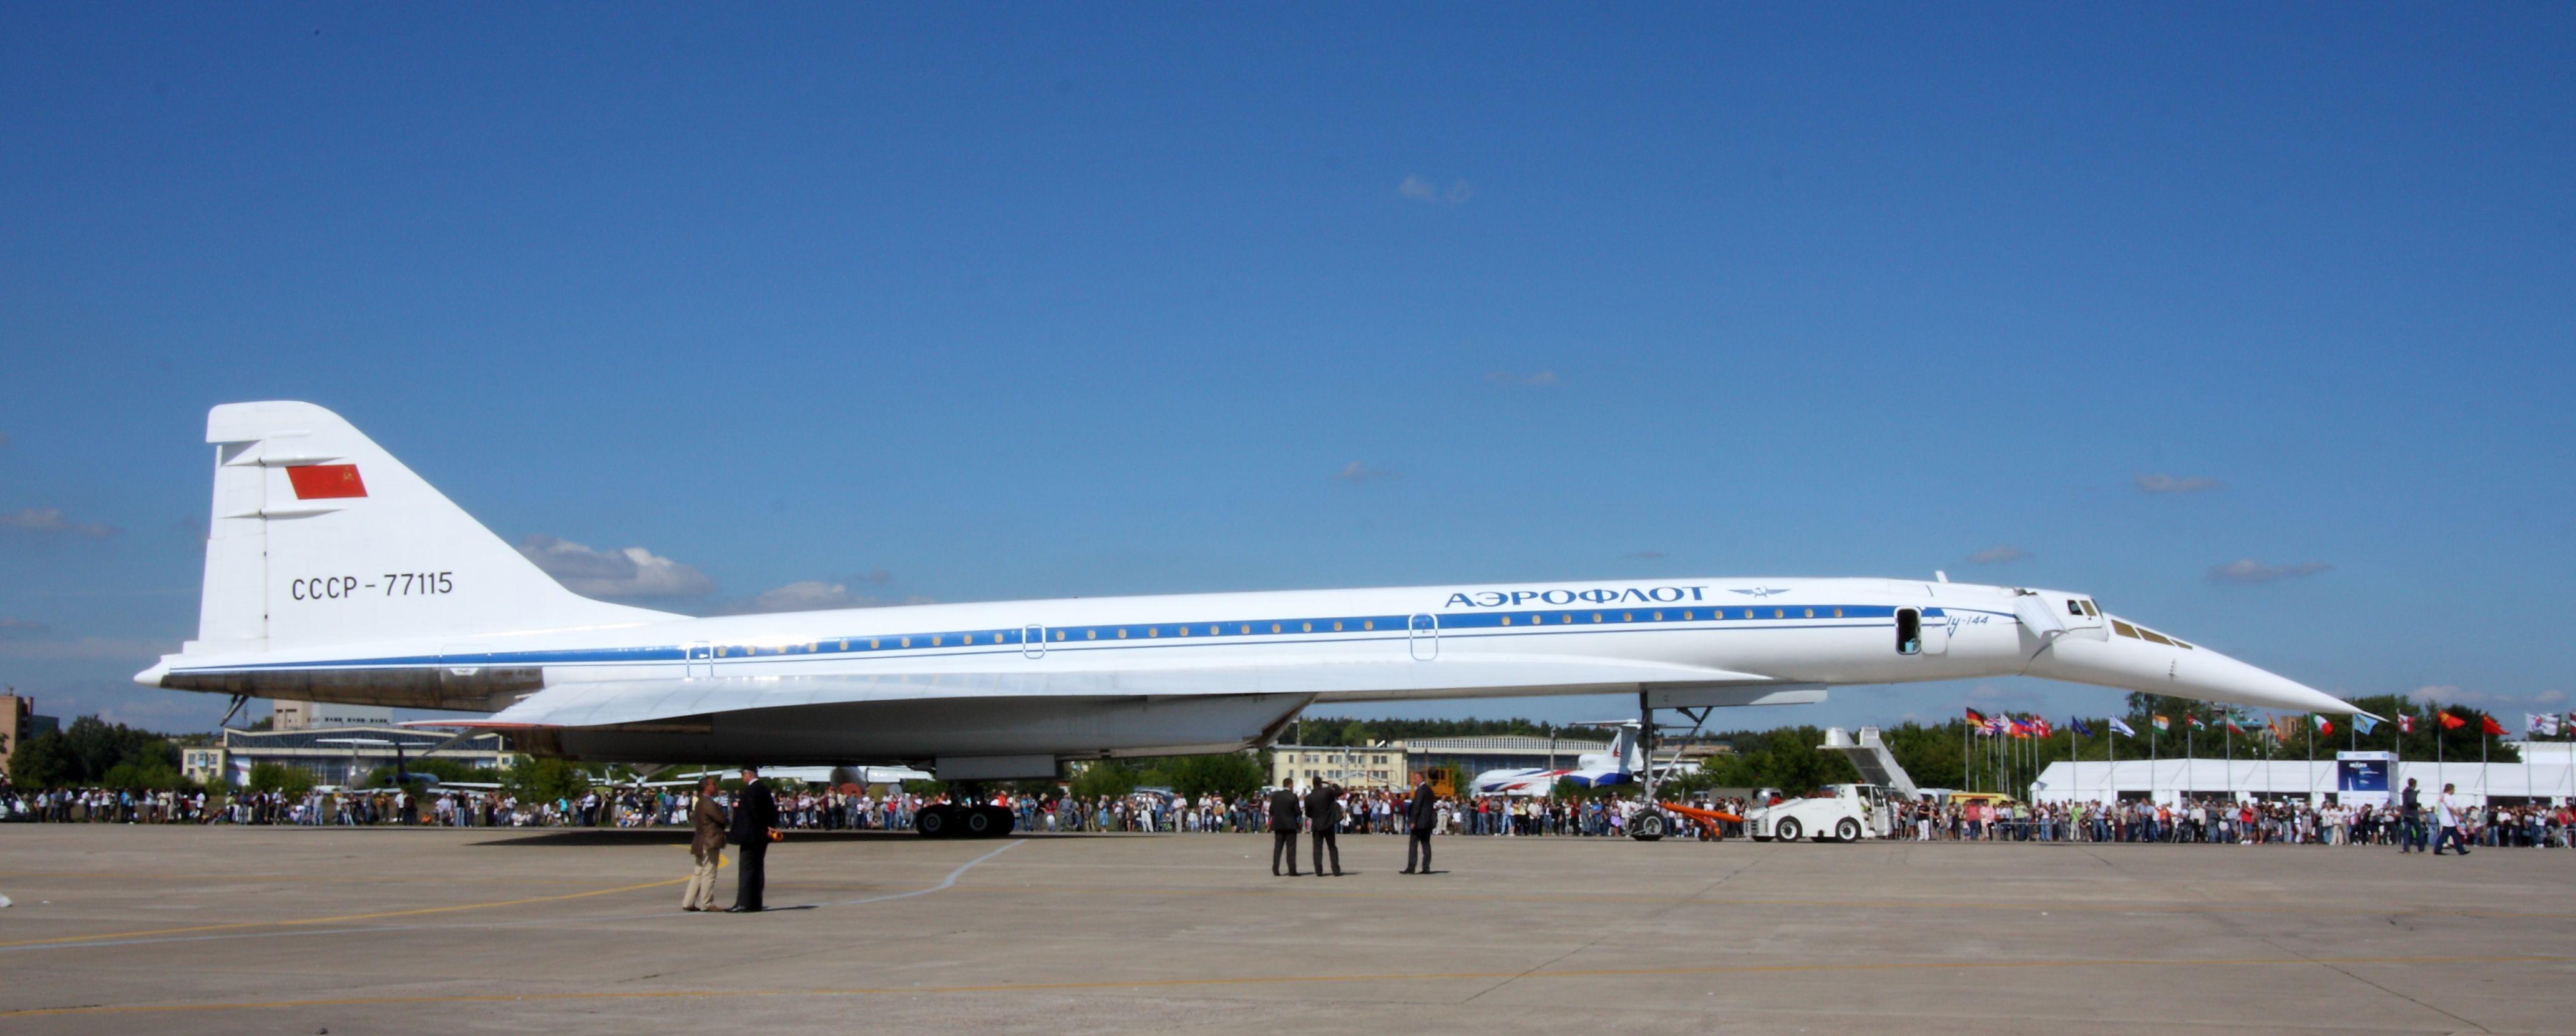 File Tupolev Tu 144 At The Maks 2011 02 Jpg Wikimedia